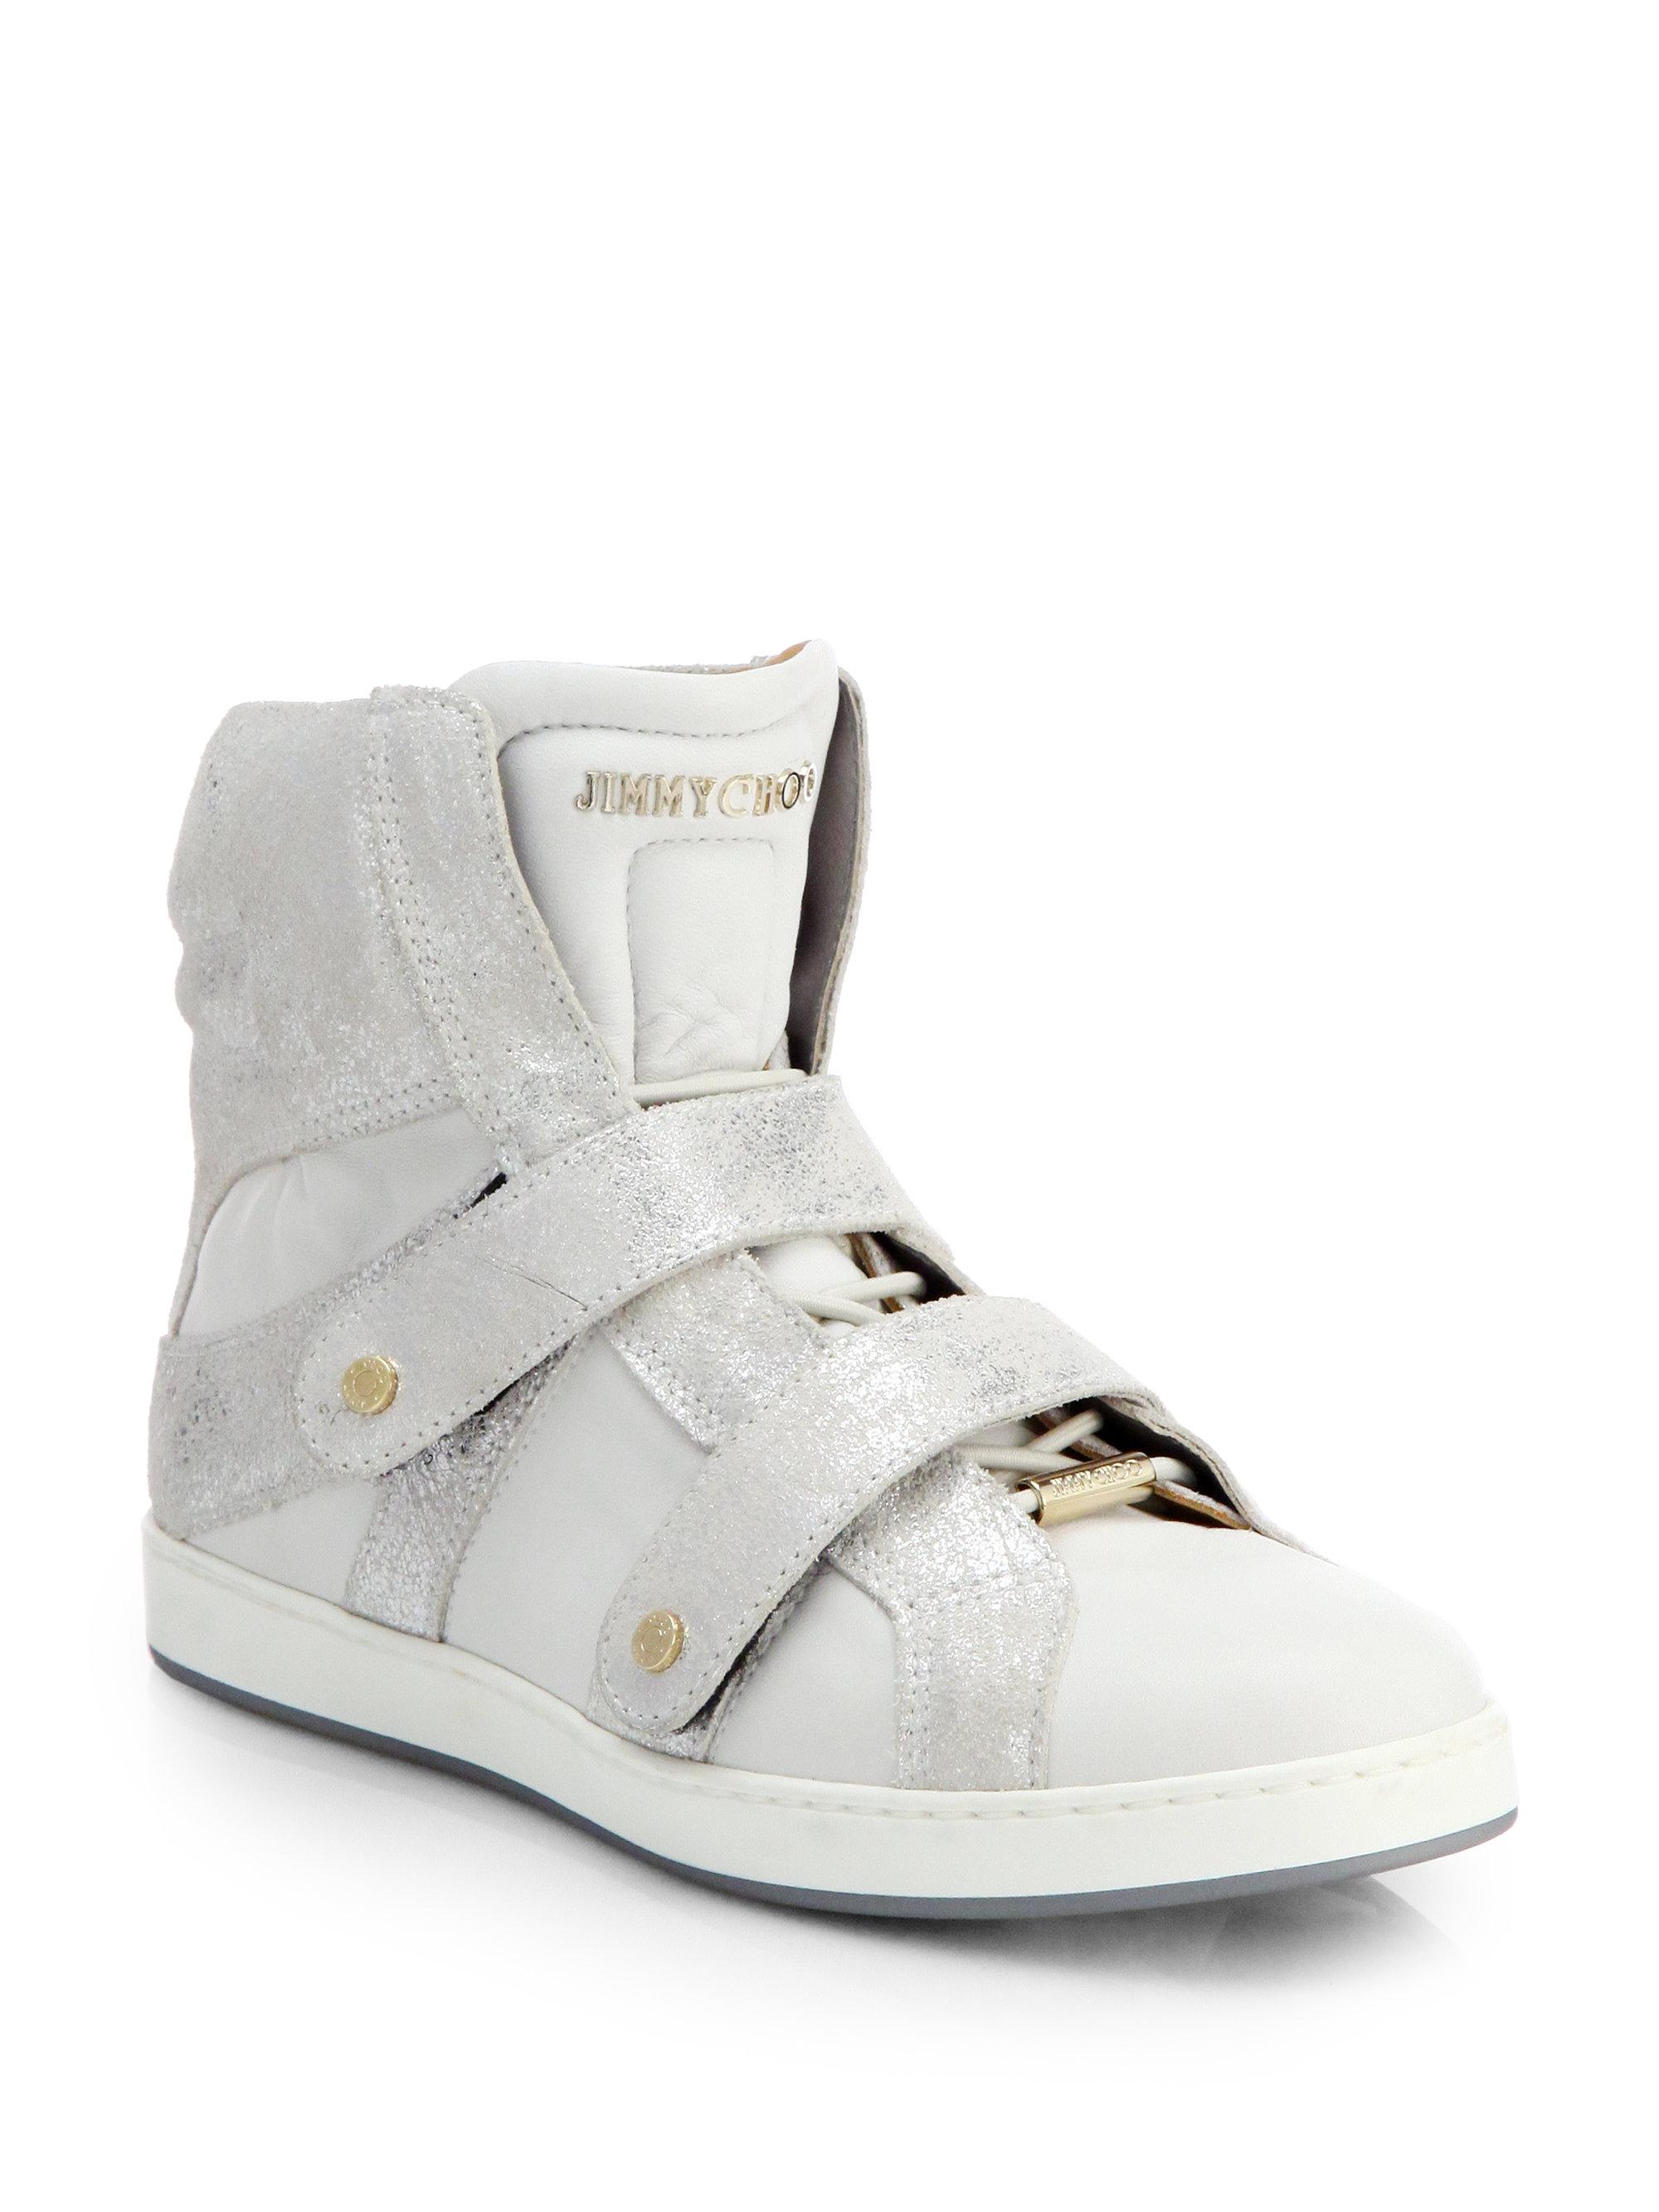 jimmy choo yazz metallic suede hightop wedge sneakers in gray off white lyst. Black Bedroom Furniture Sets. Home Design Ideas